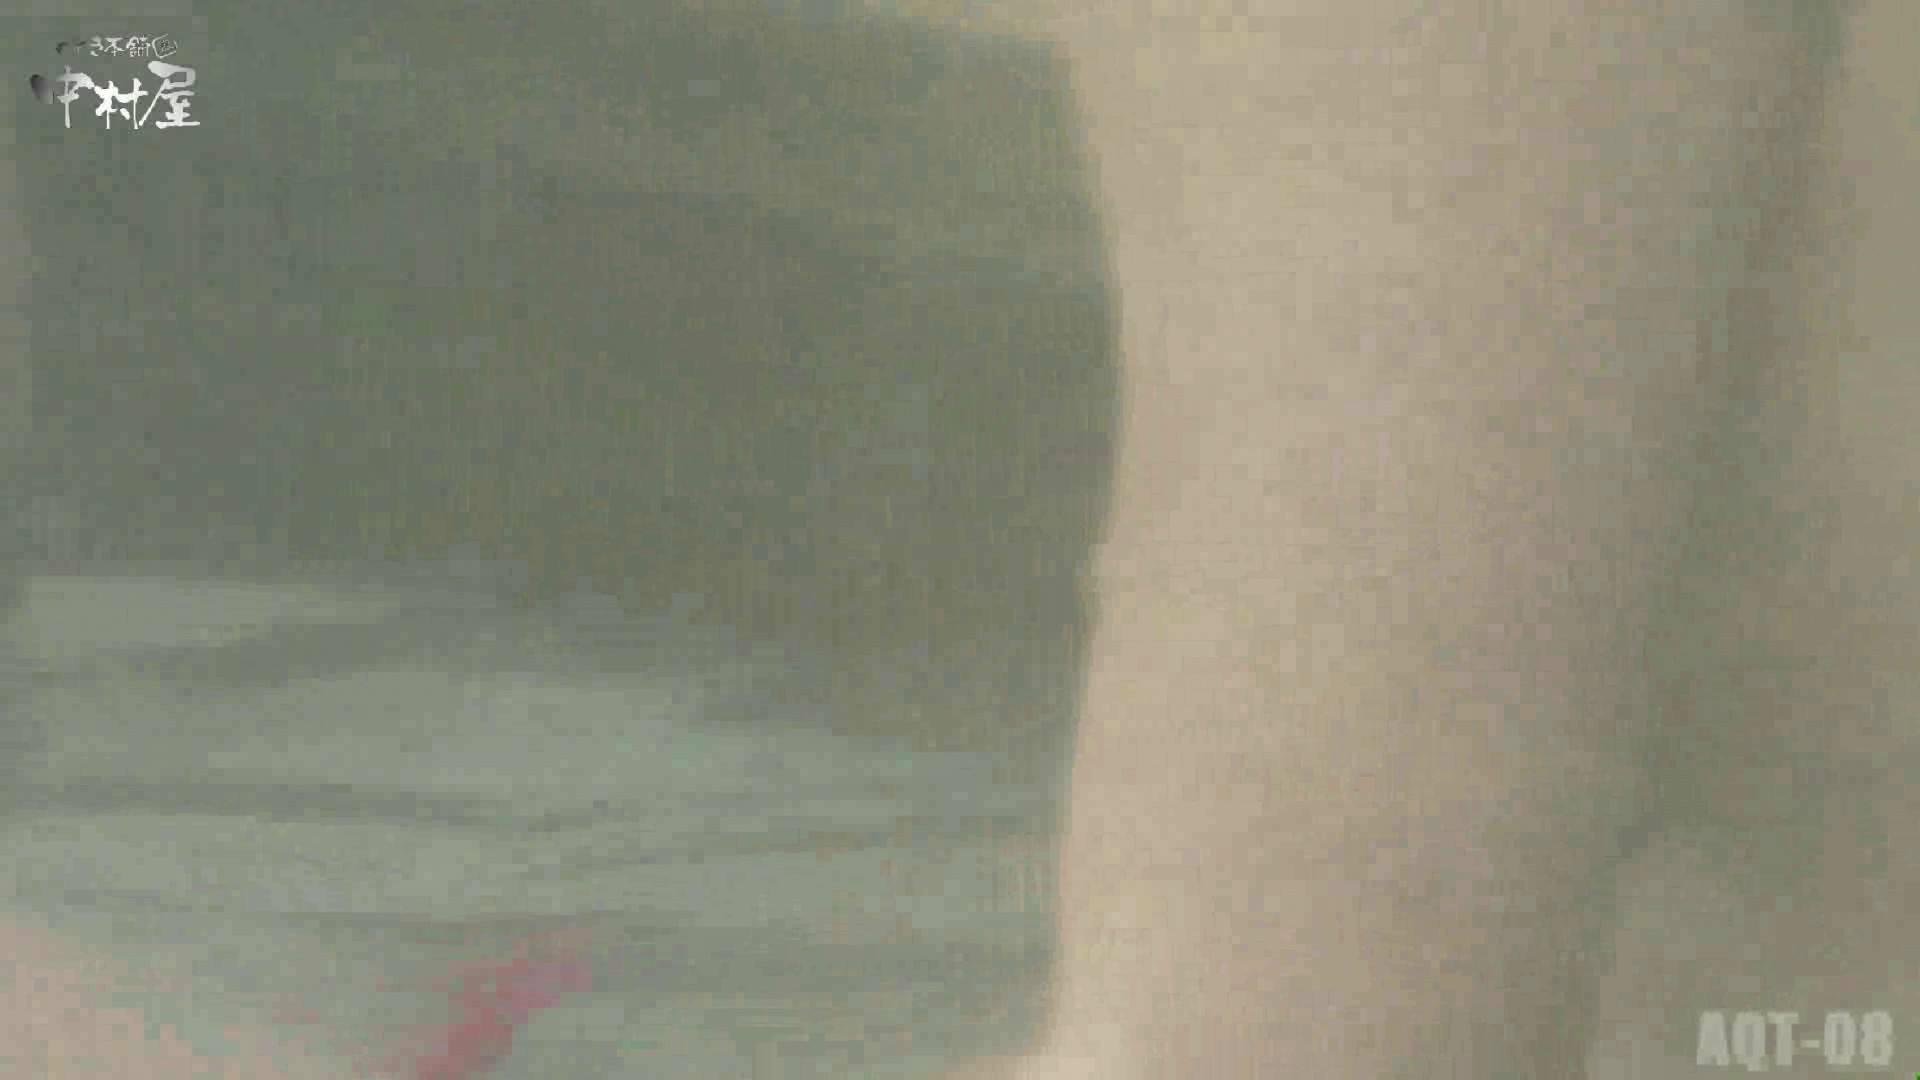 Aquaな露天風呂Vol.872潜入盗撮露天風呂八判湯 其の五 露天風呂編 セックス画像 101PIX 89